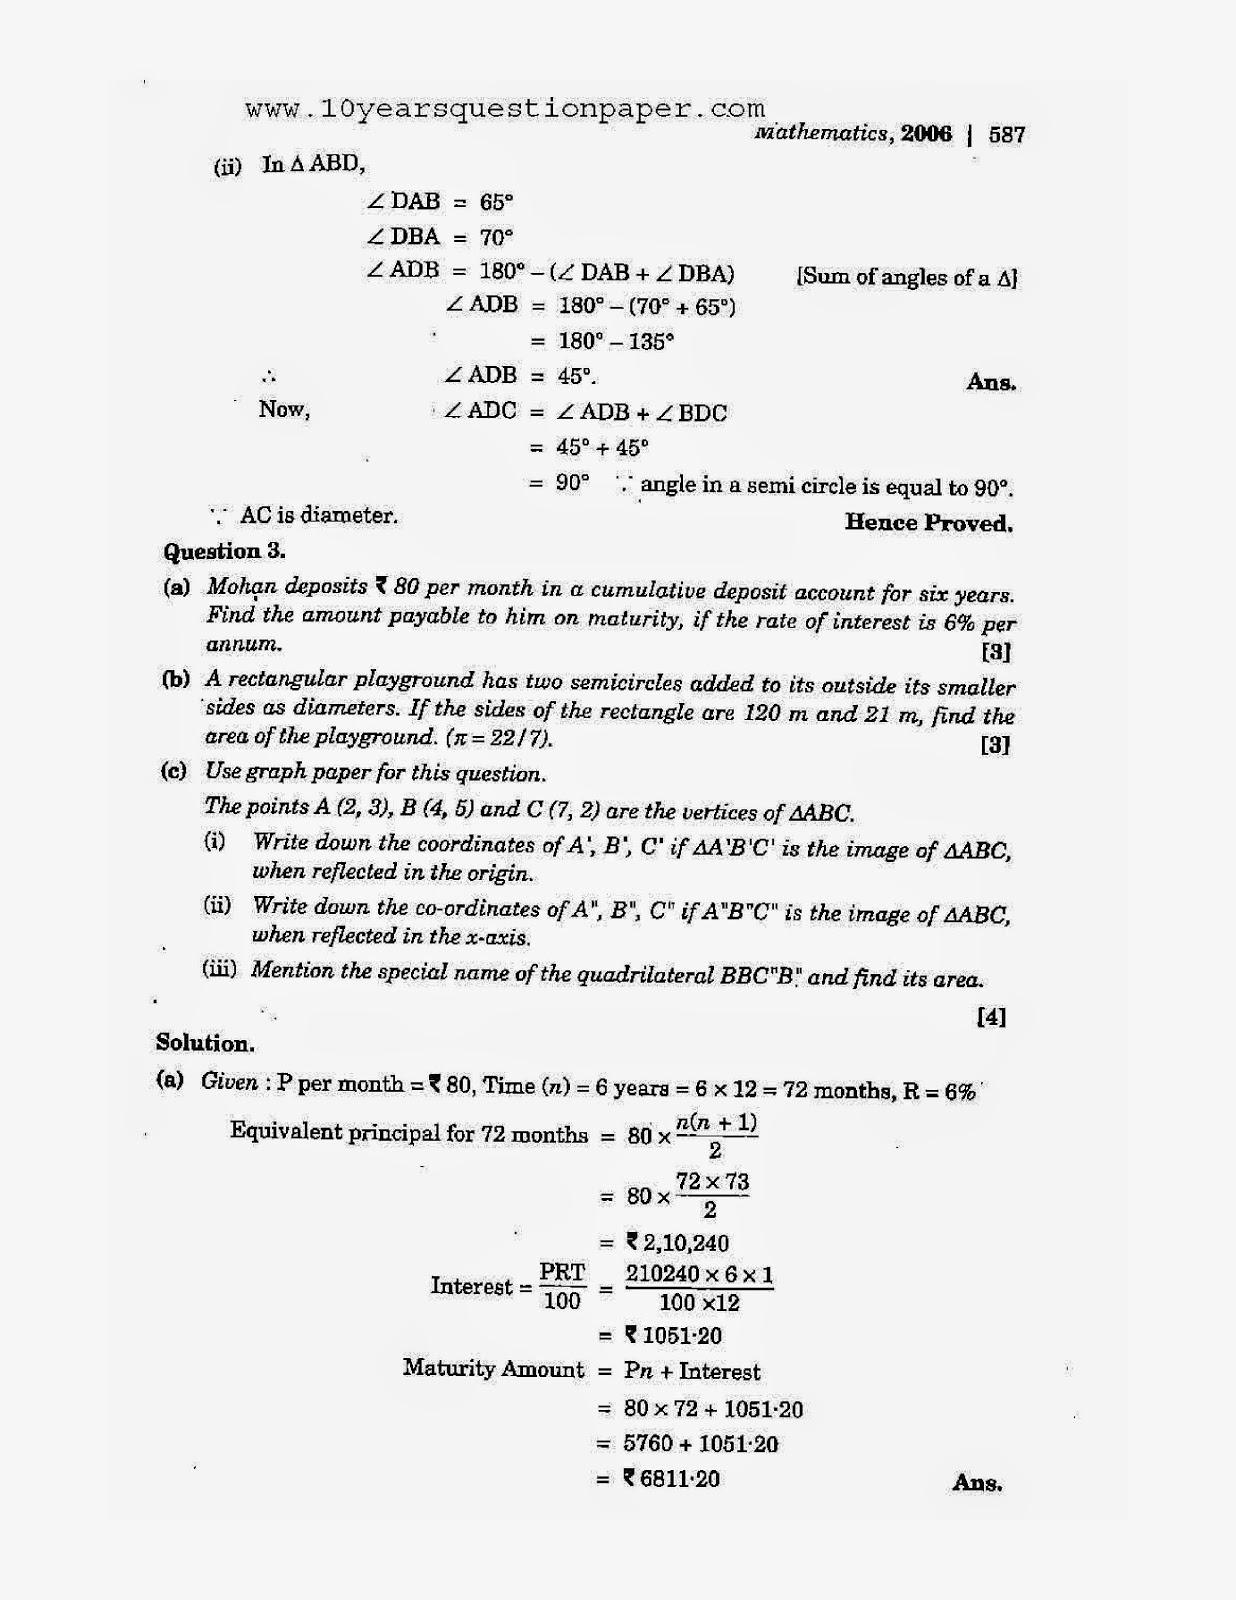 Question paper cbse (arts) class 12 business studies 2005-2006.